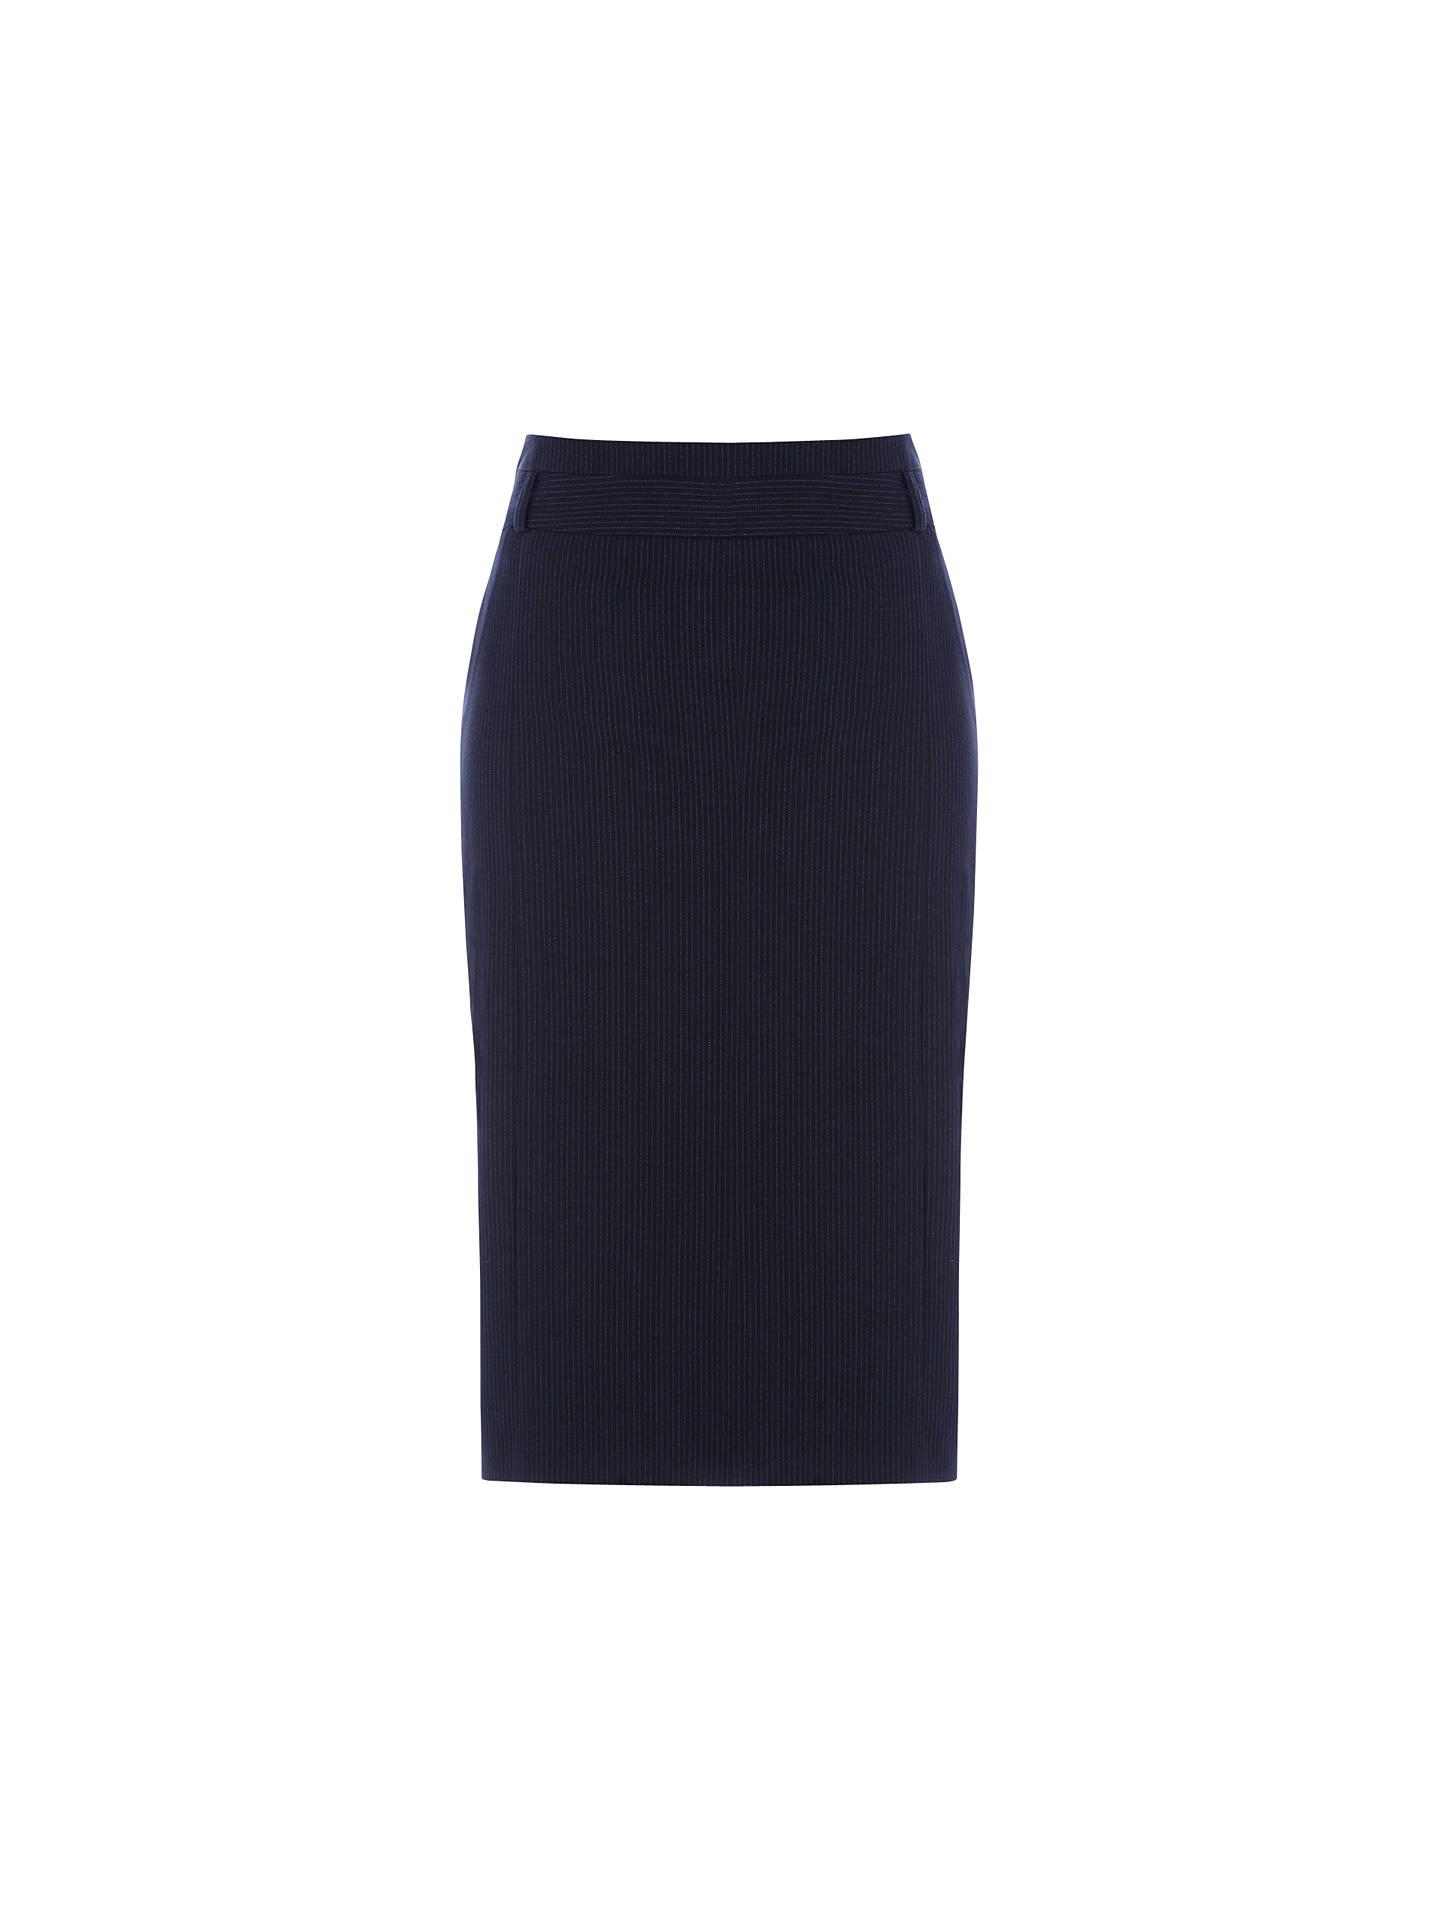 e23551b7a Buy Warehouse Pinstripe Pencil Skirt, Navy, 6 Online at johnlewis.com ...